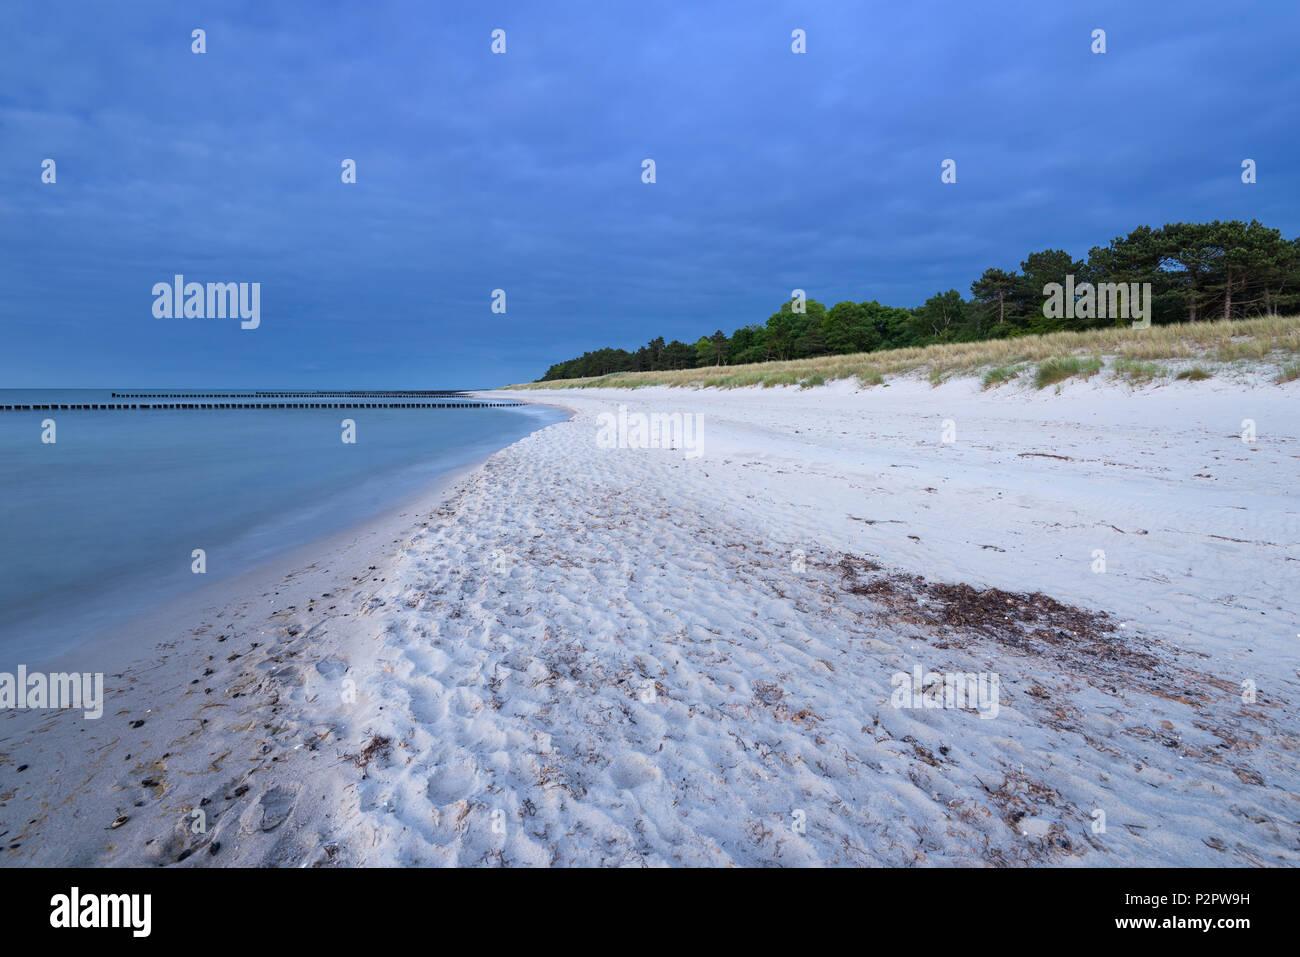 Summer, Beach, Dam, Blue Hour, Baltic Sea, Mecklenburg, Germany, Europe - Stock Image